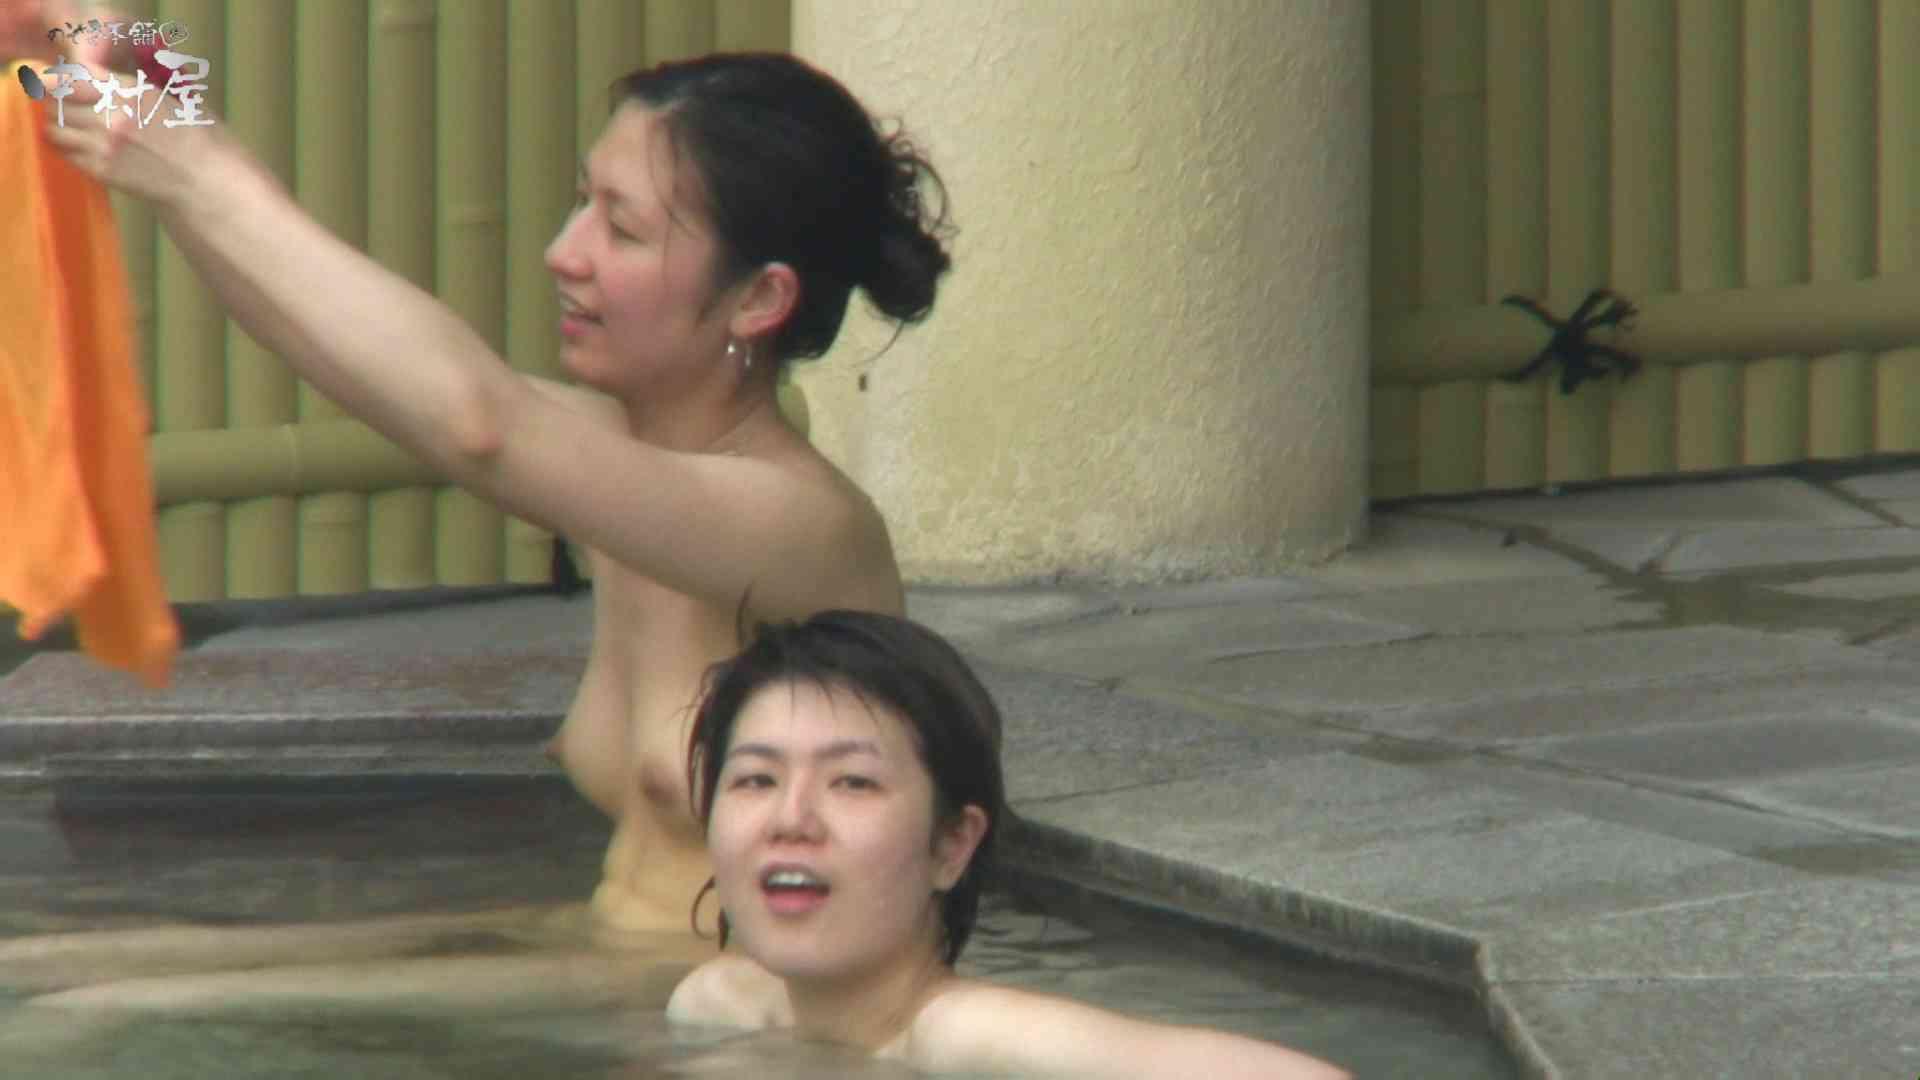 Aquaな露天風呂Vol.945 盗撮 | OLエロ画像  60PICs 19